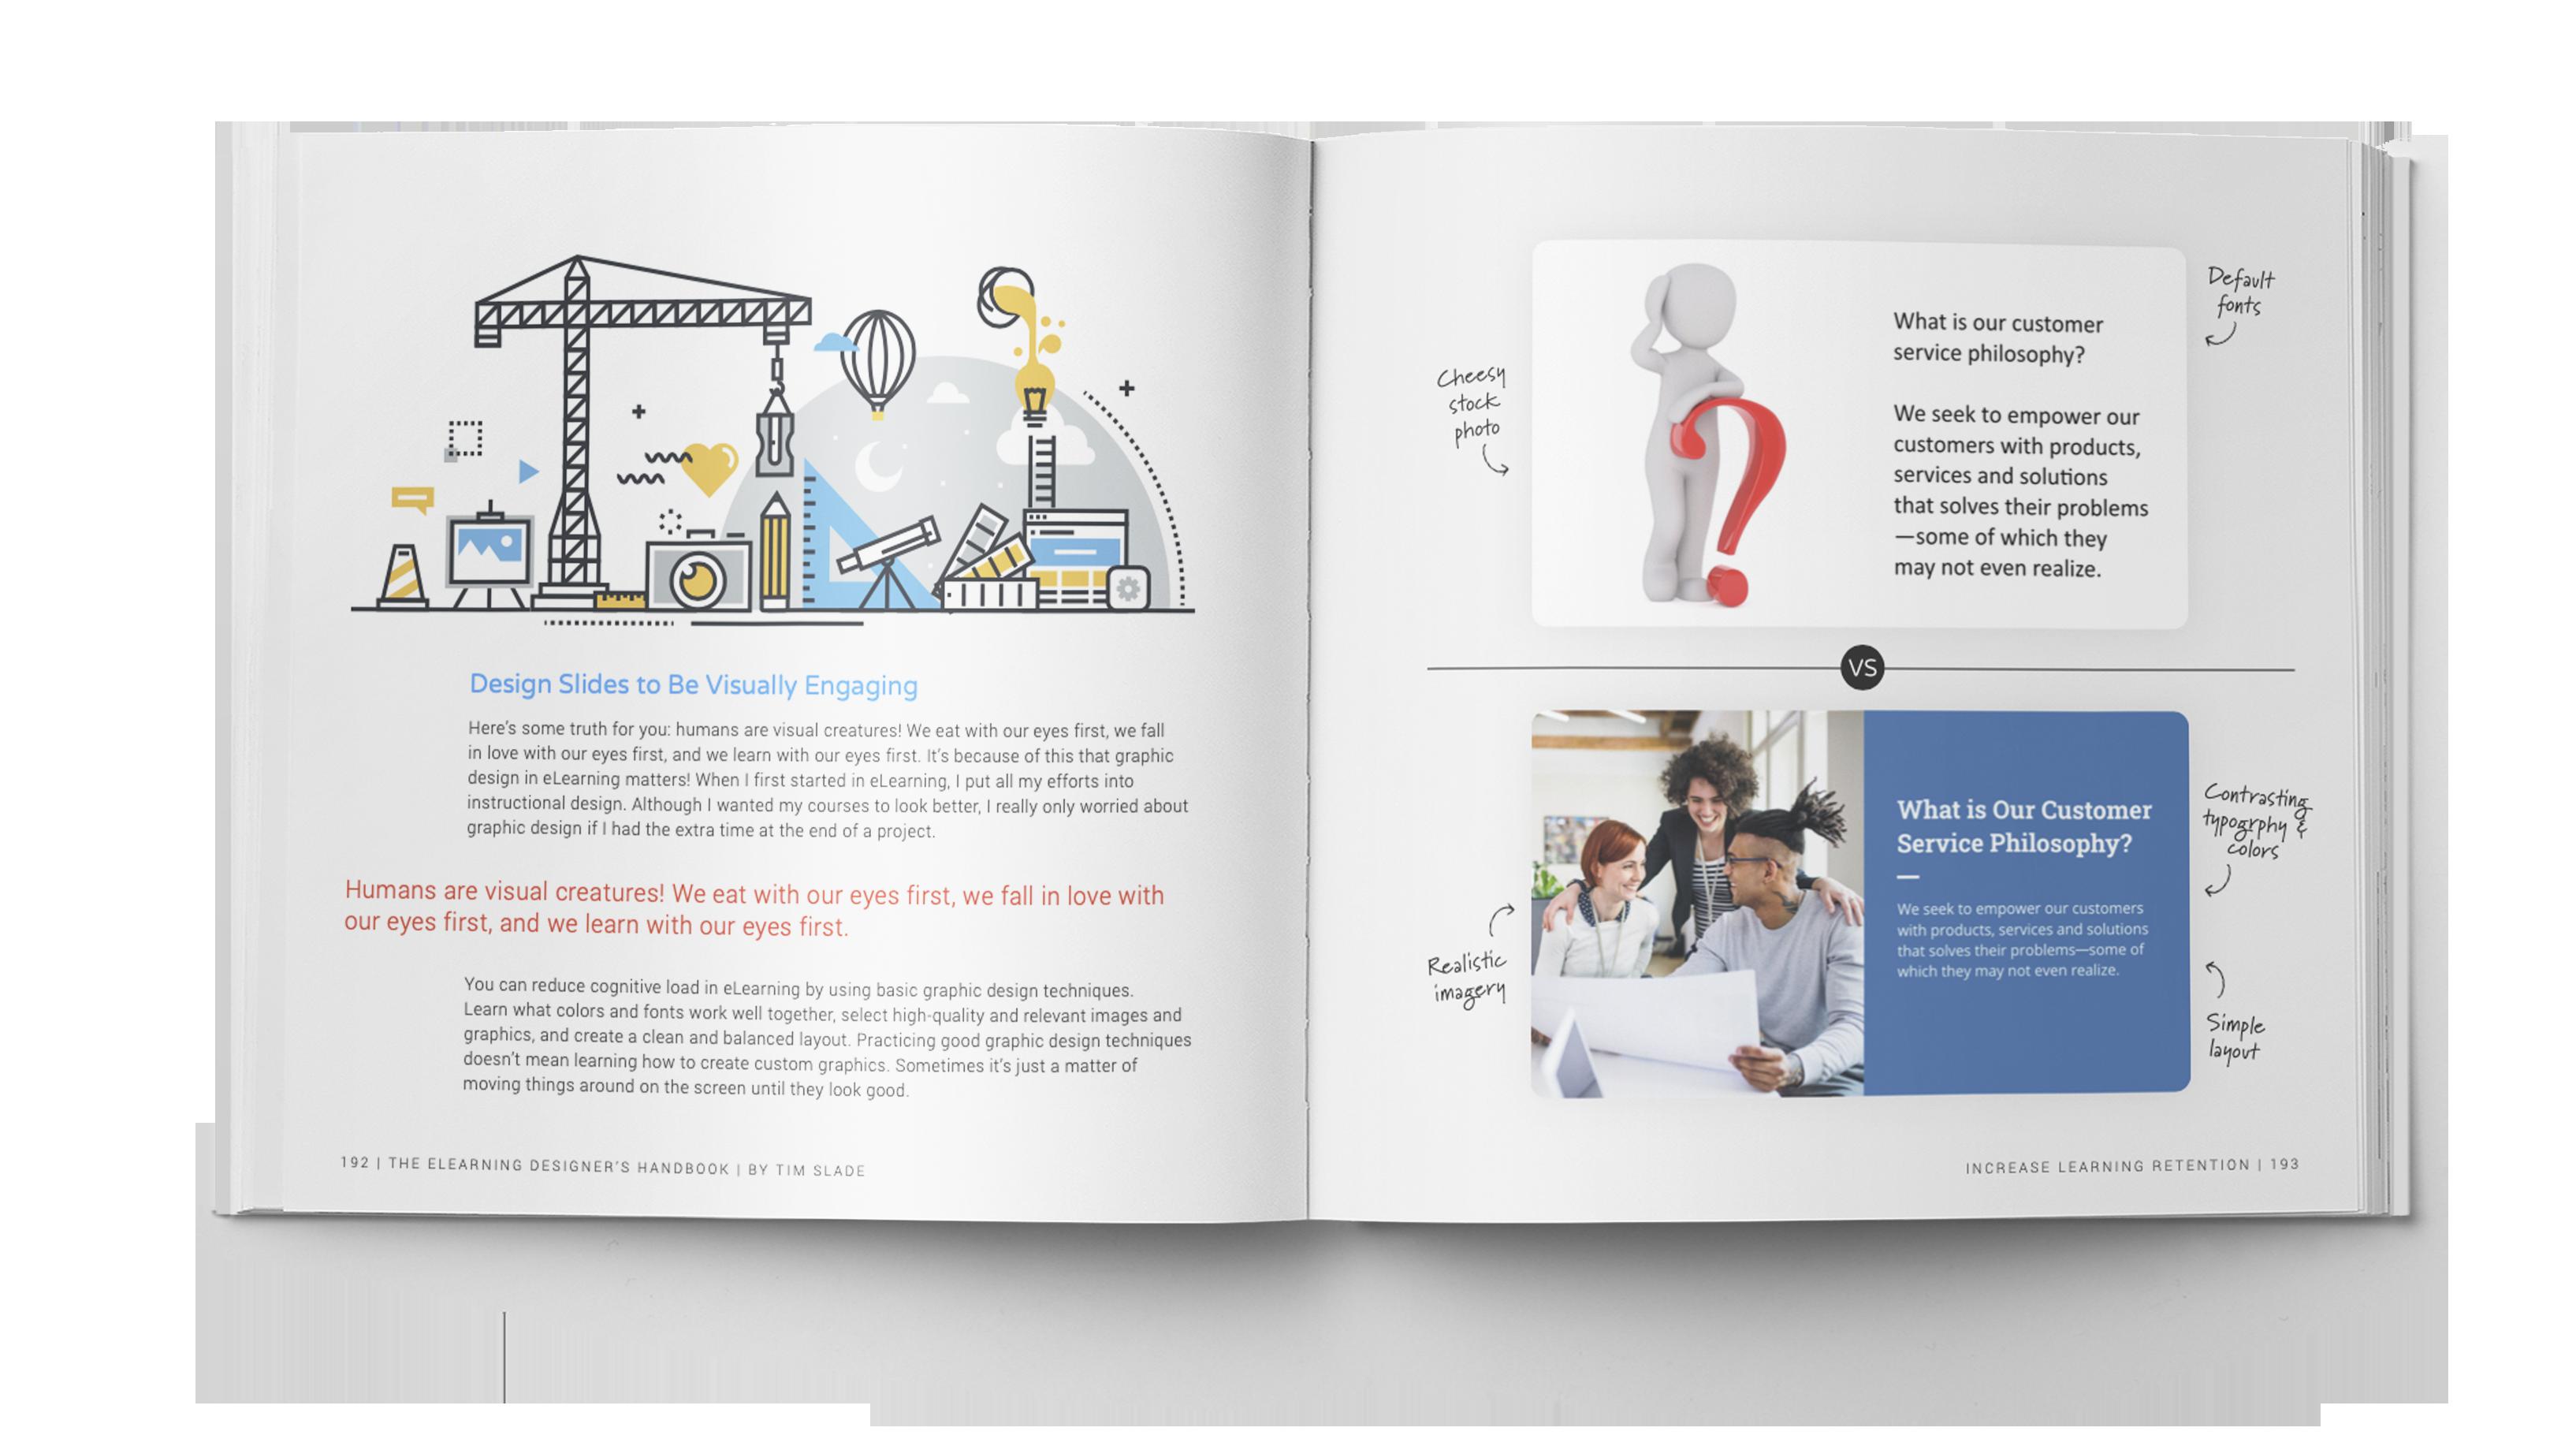 The eLearning Designer's Handbook by Tim Slade   Increase Learning Retention   Freelance eLearning Designer   The eLearning Designer's Academy